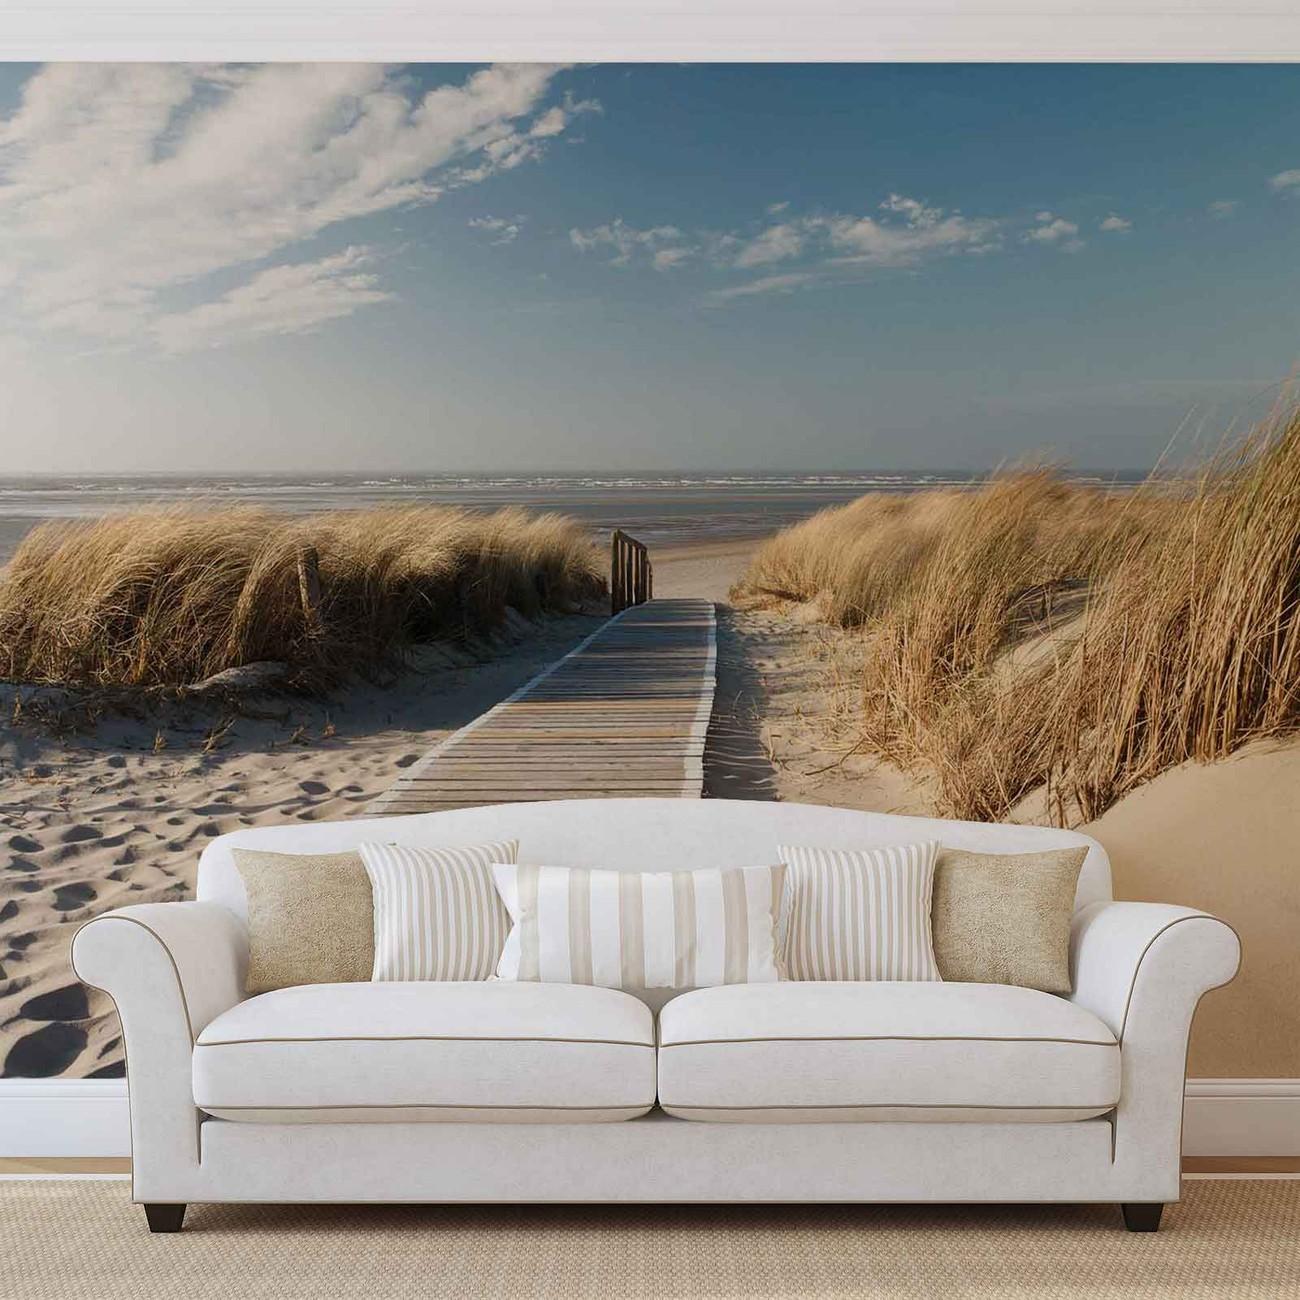 fototapete tapete weg strand natur bei europosters kostenloser versand. Black Bedroom Furniture Sets. Home Design Ideas